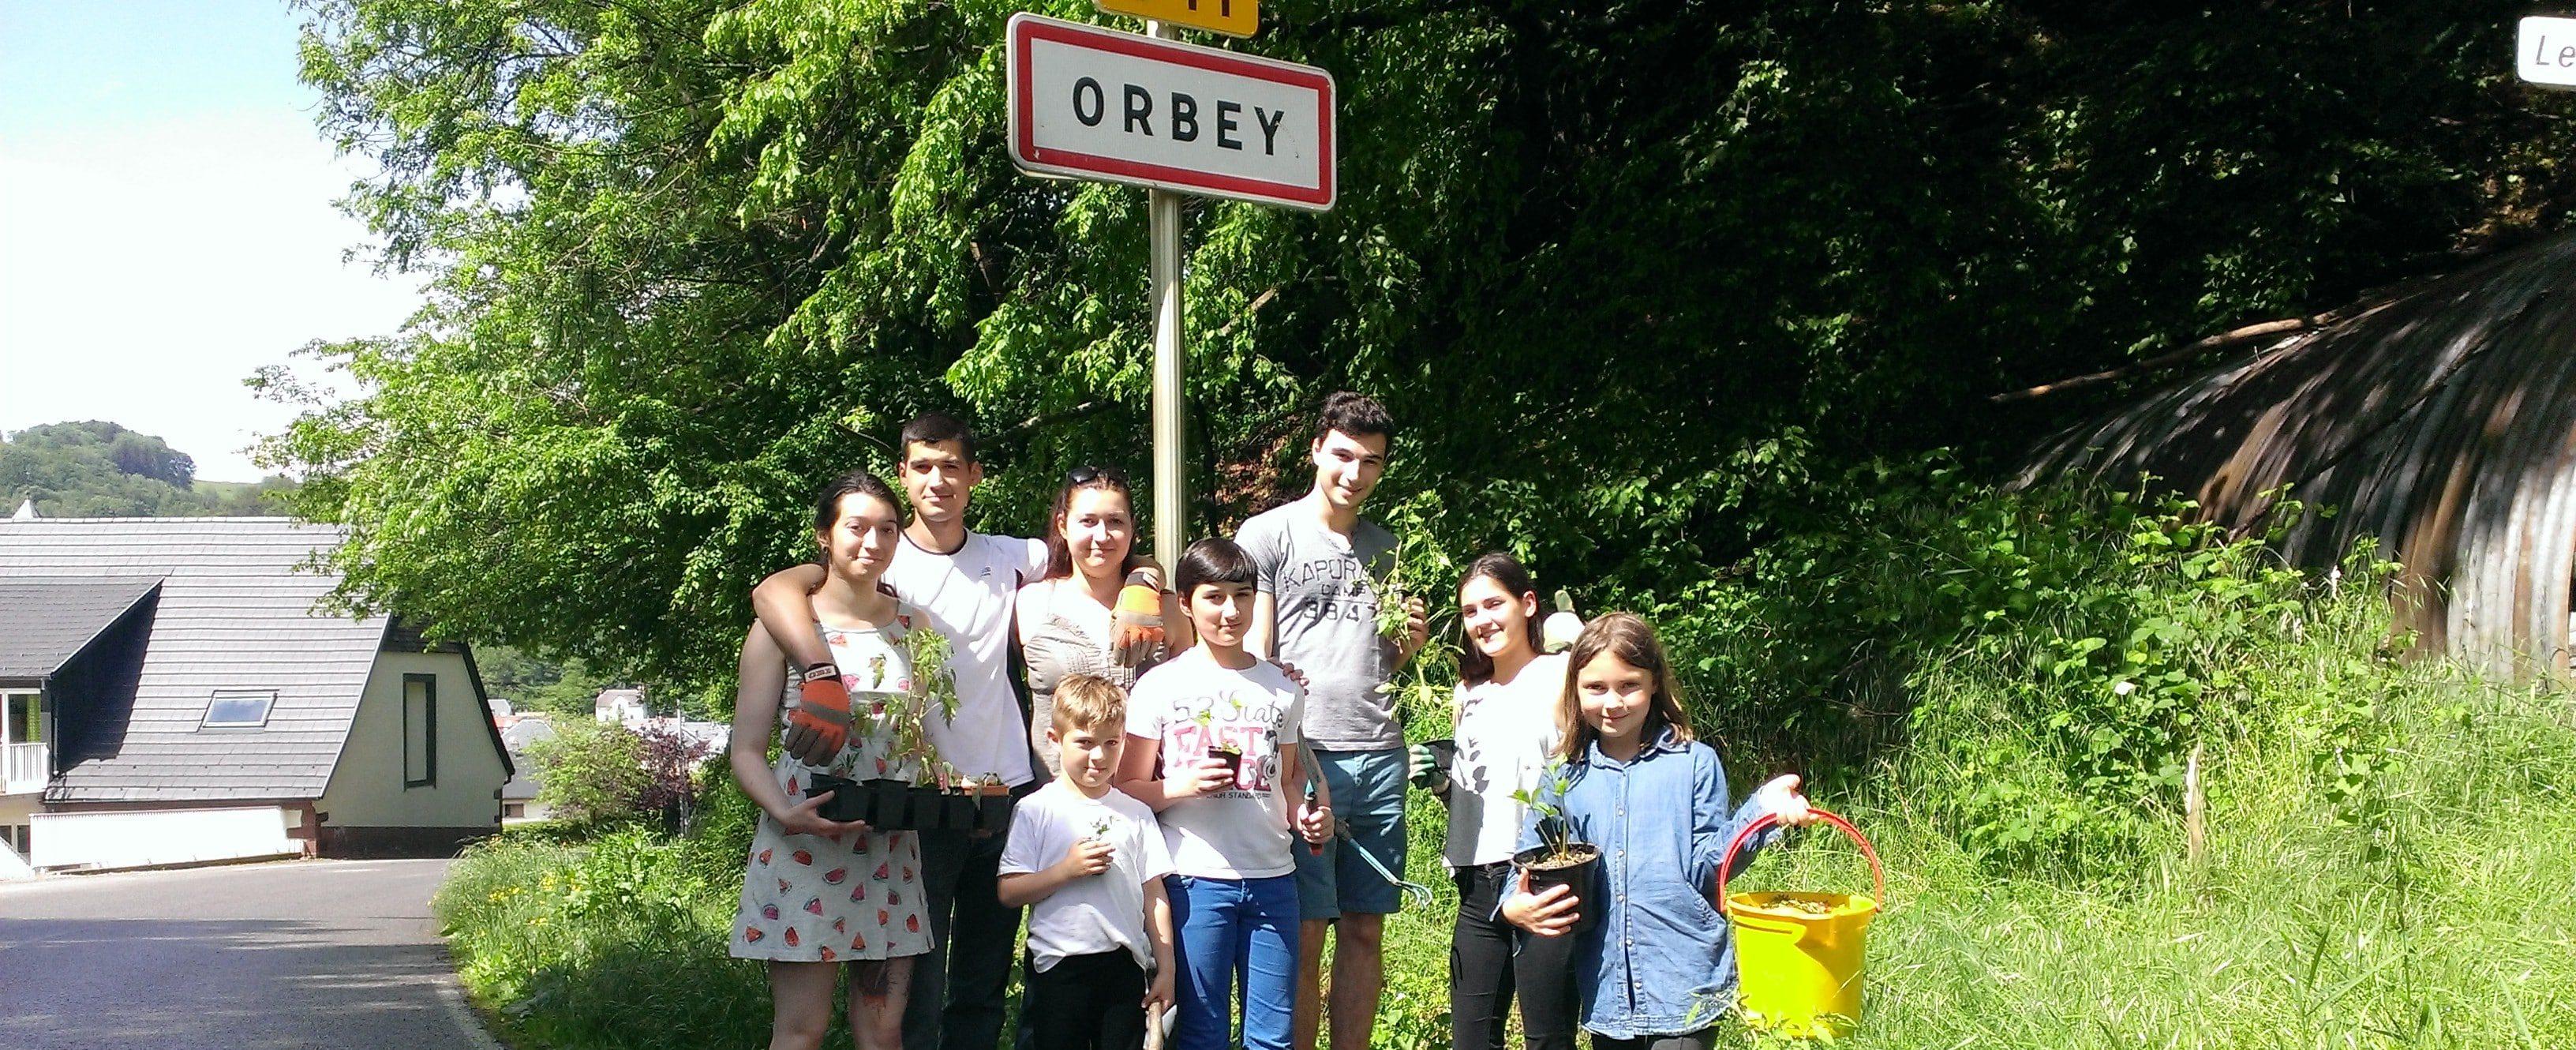 Orbey_Panneau_Groupe